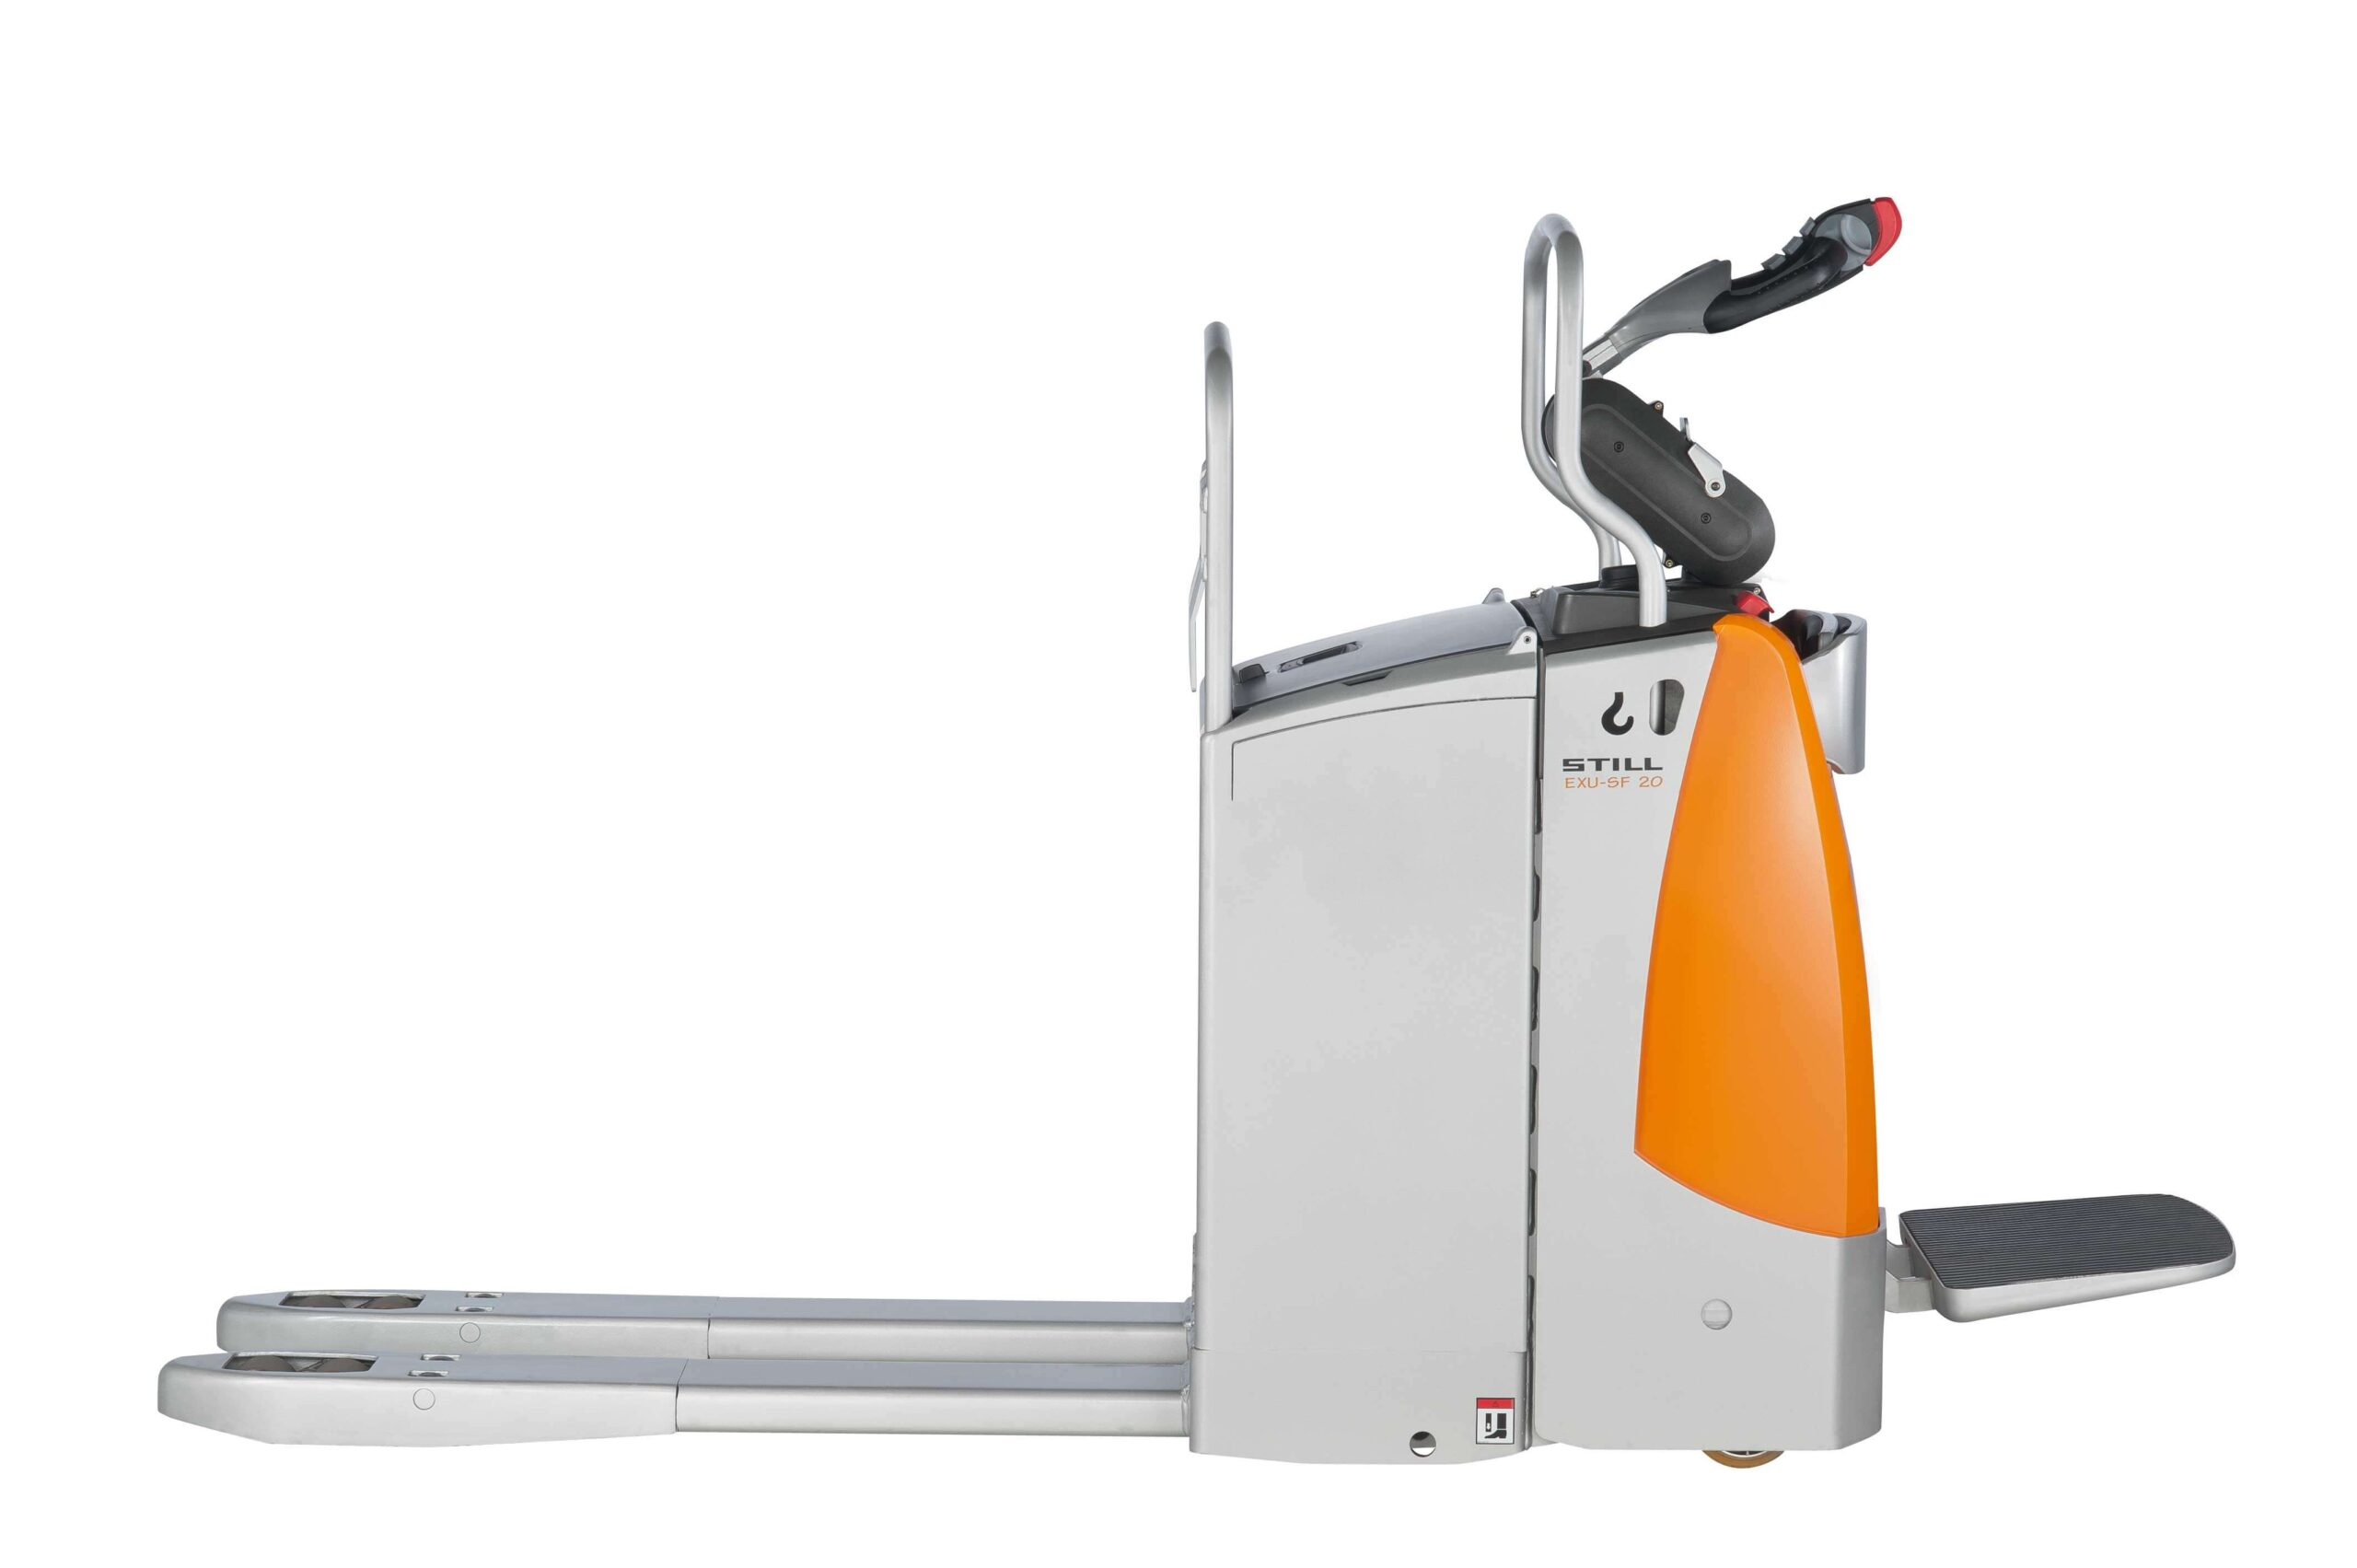 THE STILL EXU-SF : Gwent Mechanical Handling